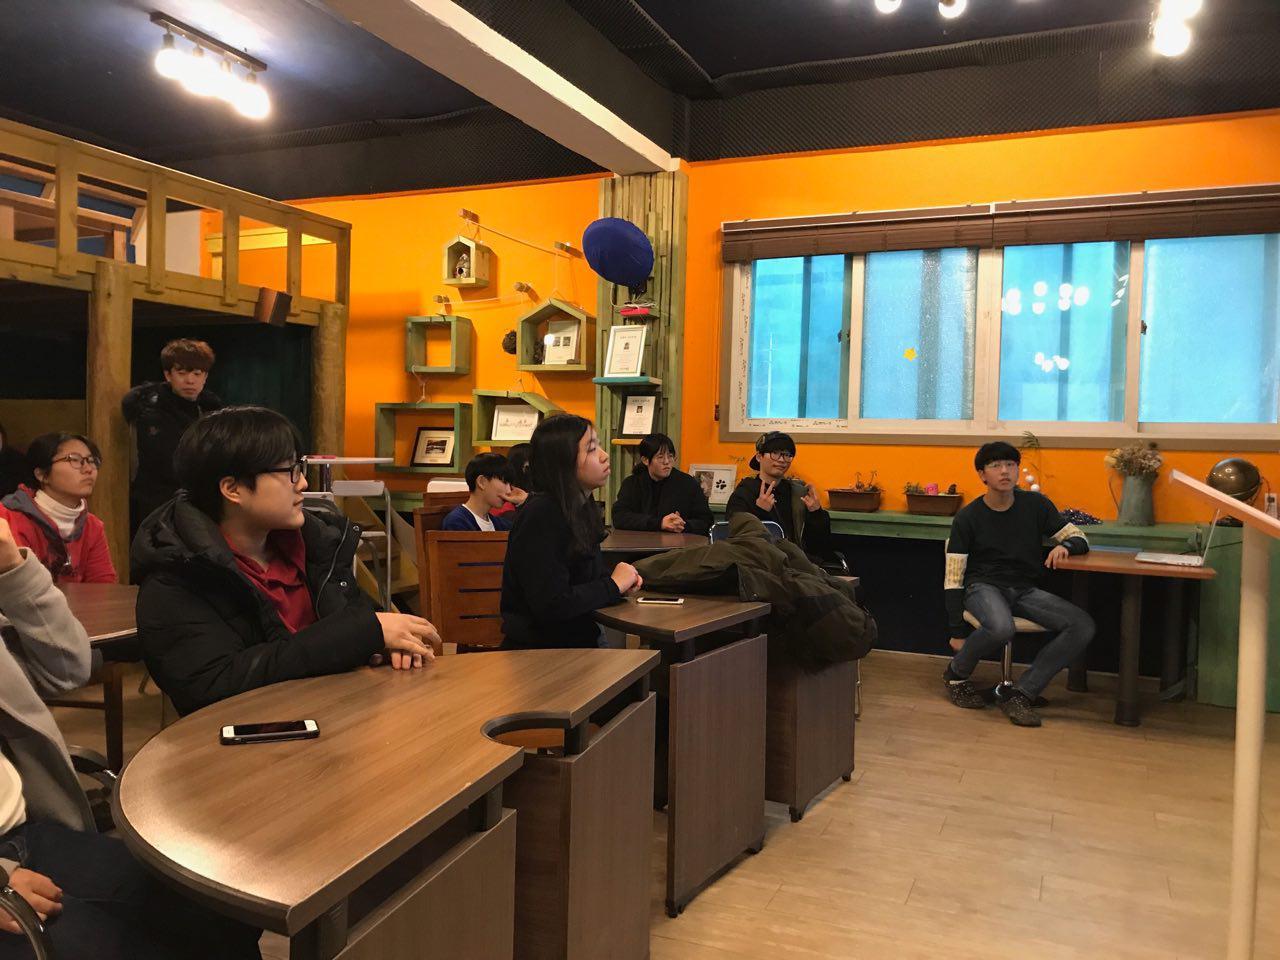 photo_2018-02-22_10-04-32.jpg